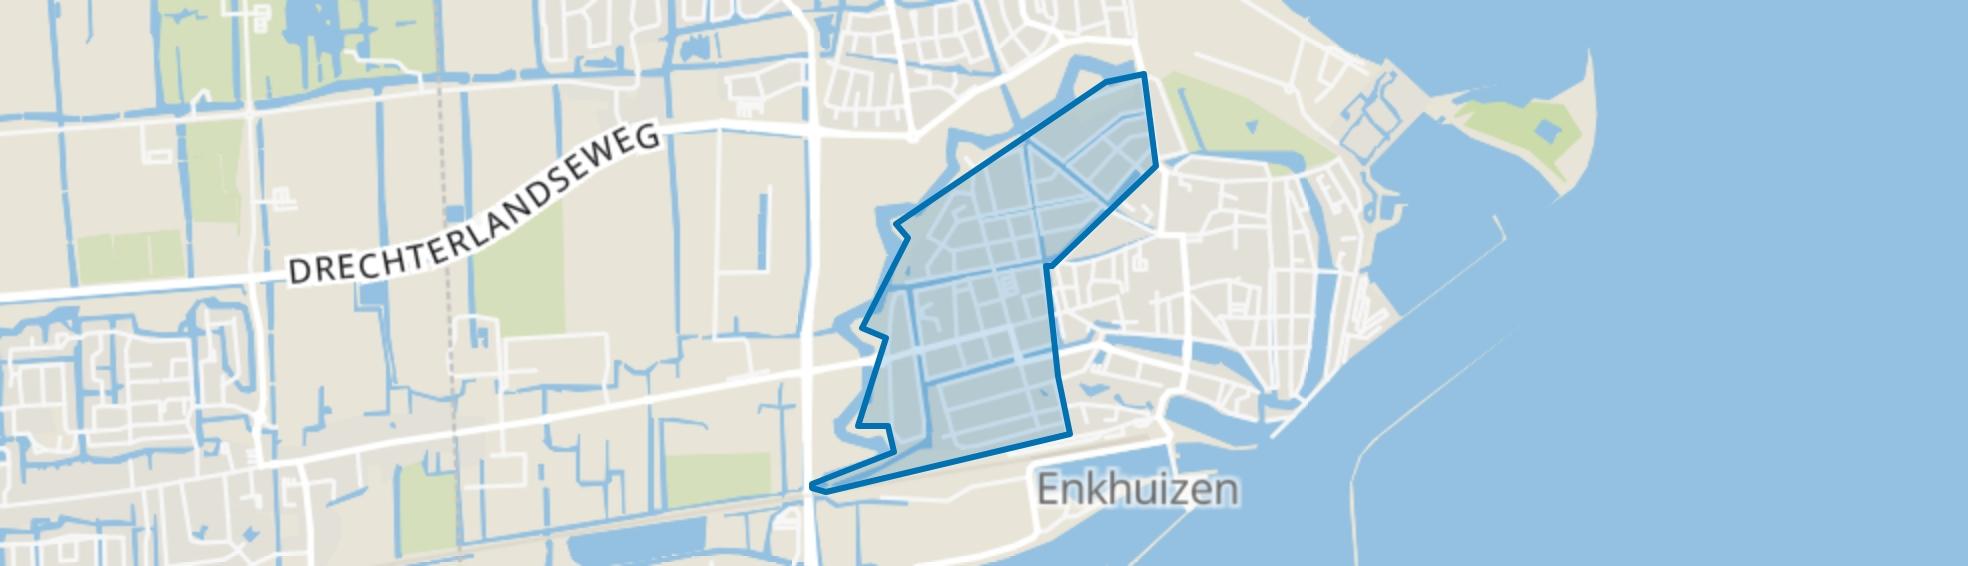 Boerenhoek Molenweg Burgwal, Enkhuizen map